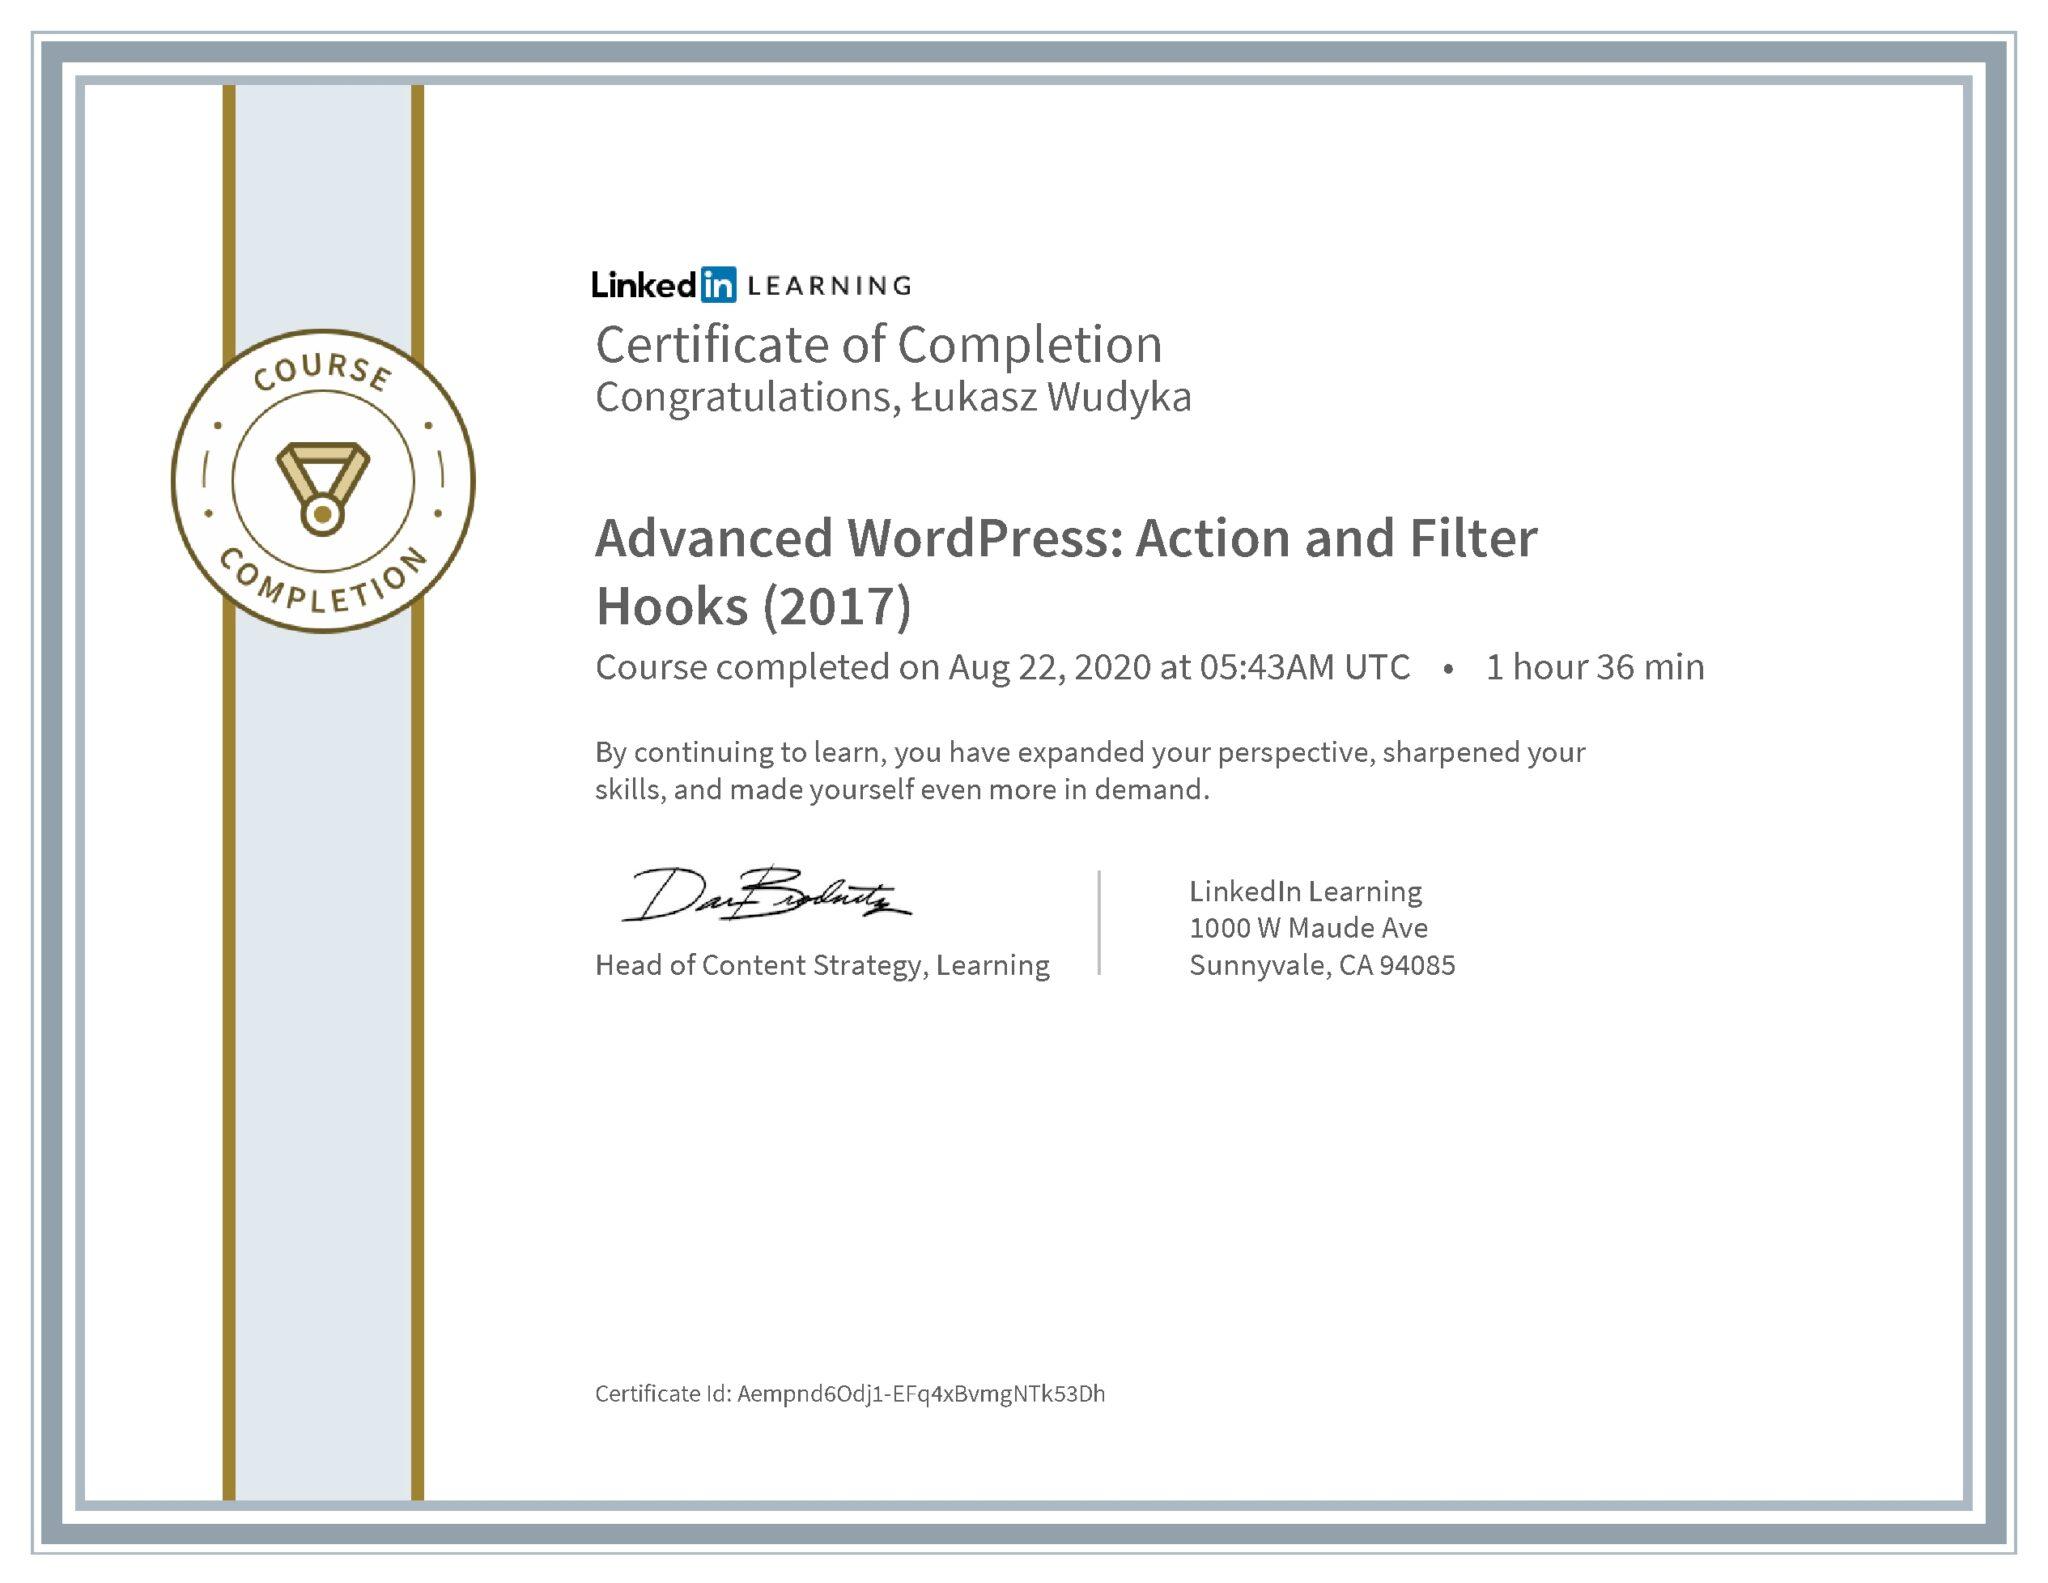 Łukasz Wudyka certyfikat LinkedIn Advanced WordPress: Action and Filter Hooks (2017)